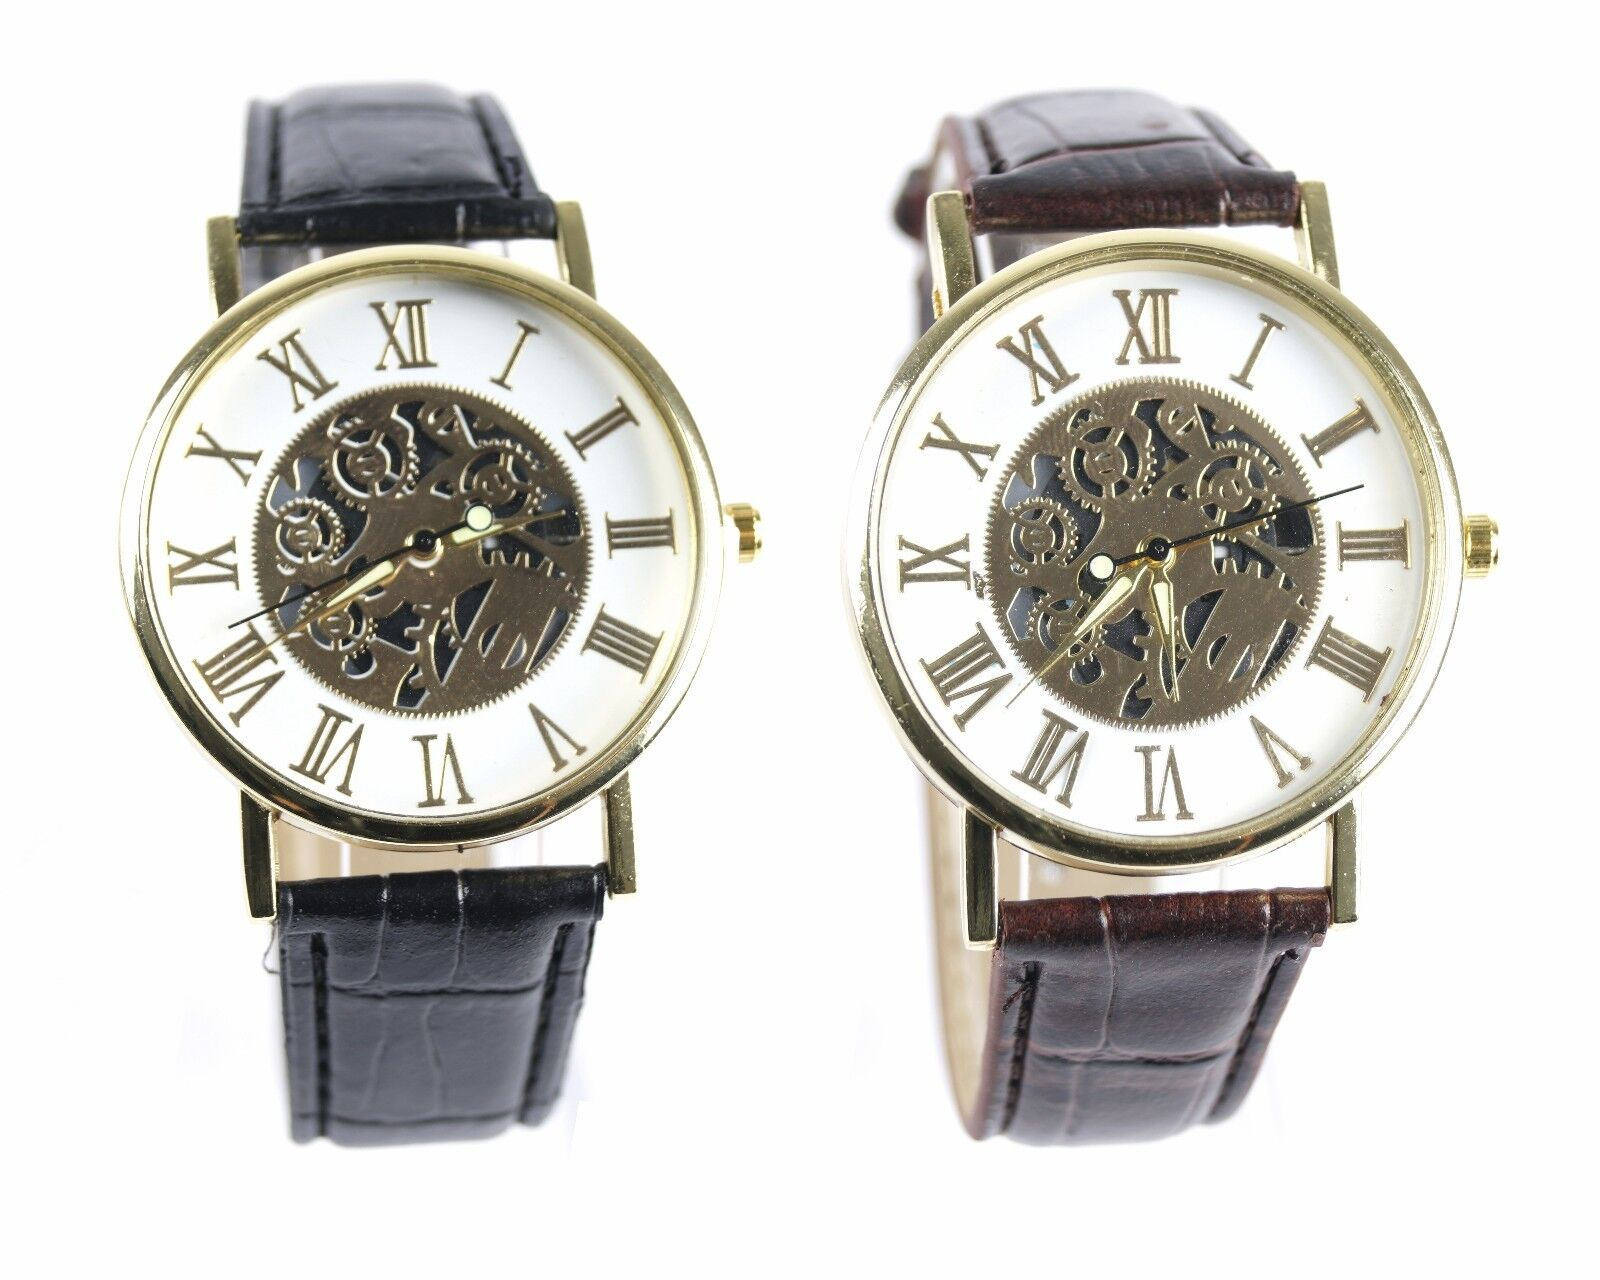 Herren Lederarmbanduhr Armbanduhr Herrenuhr Automatikuhr Männer Römische Ziffern